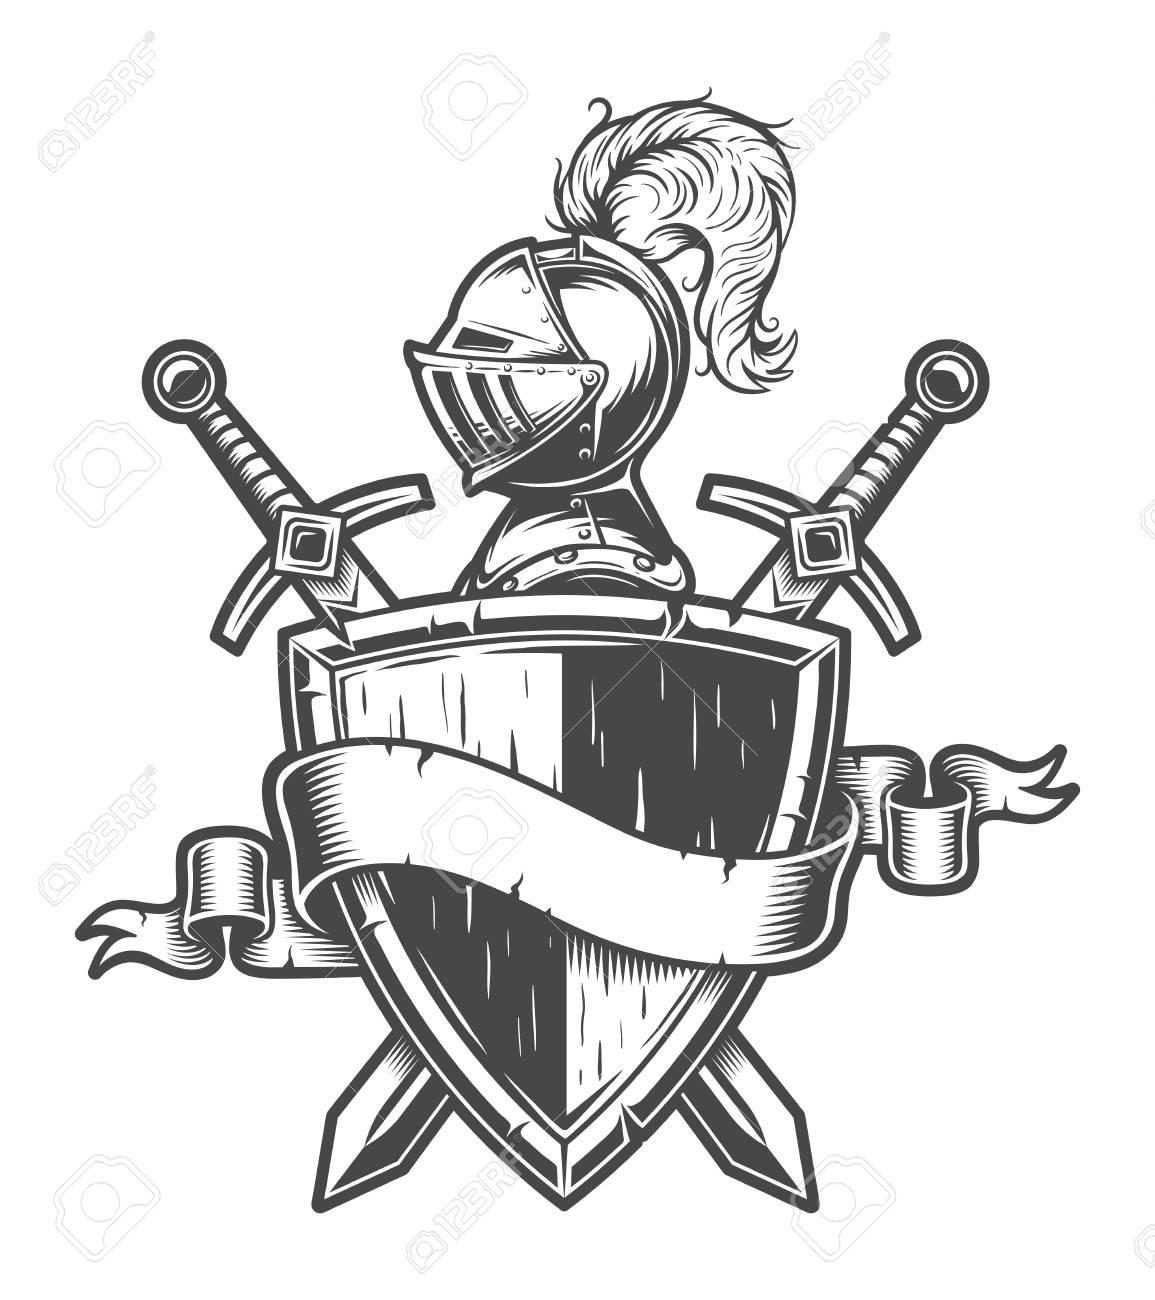 Vintage medieval knight emblem - 105268790